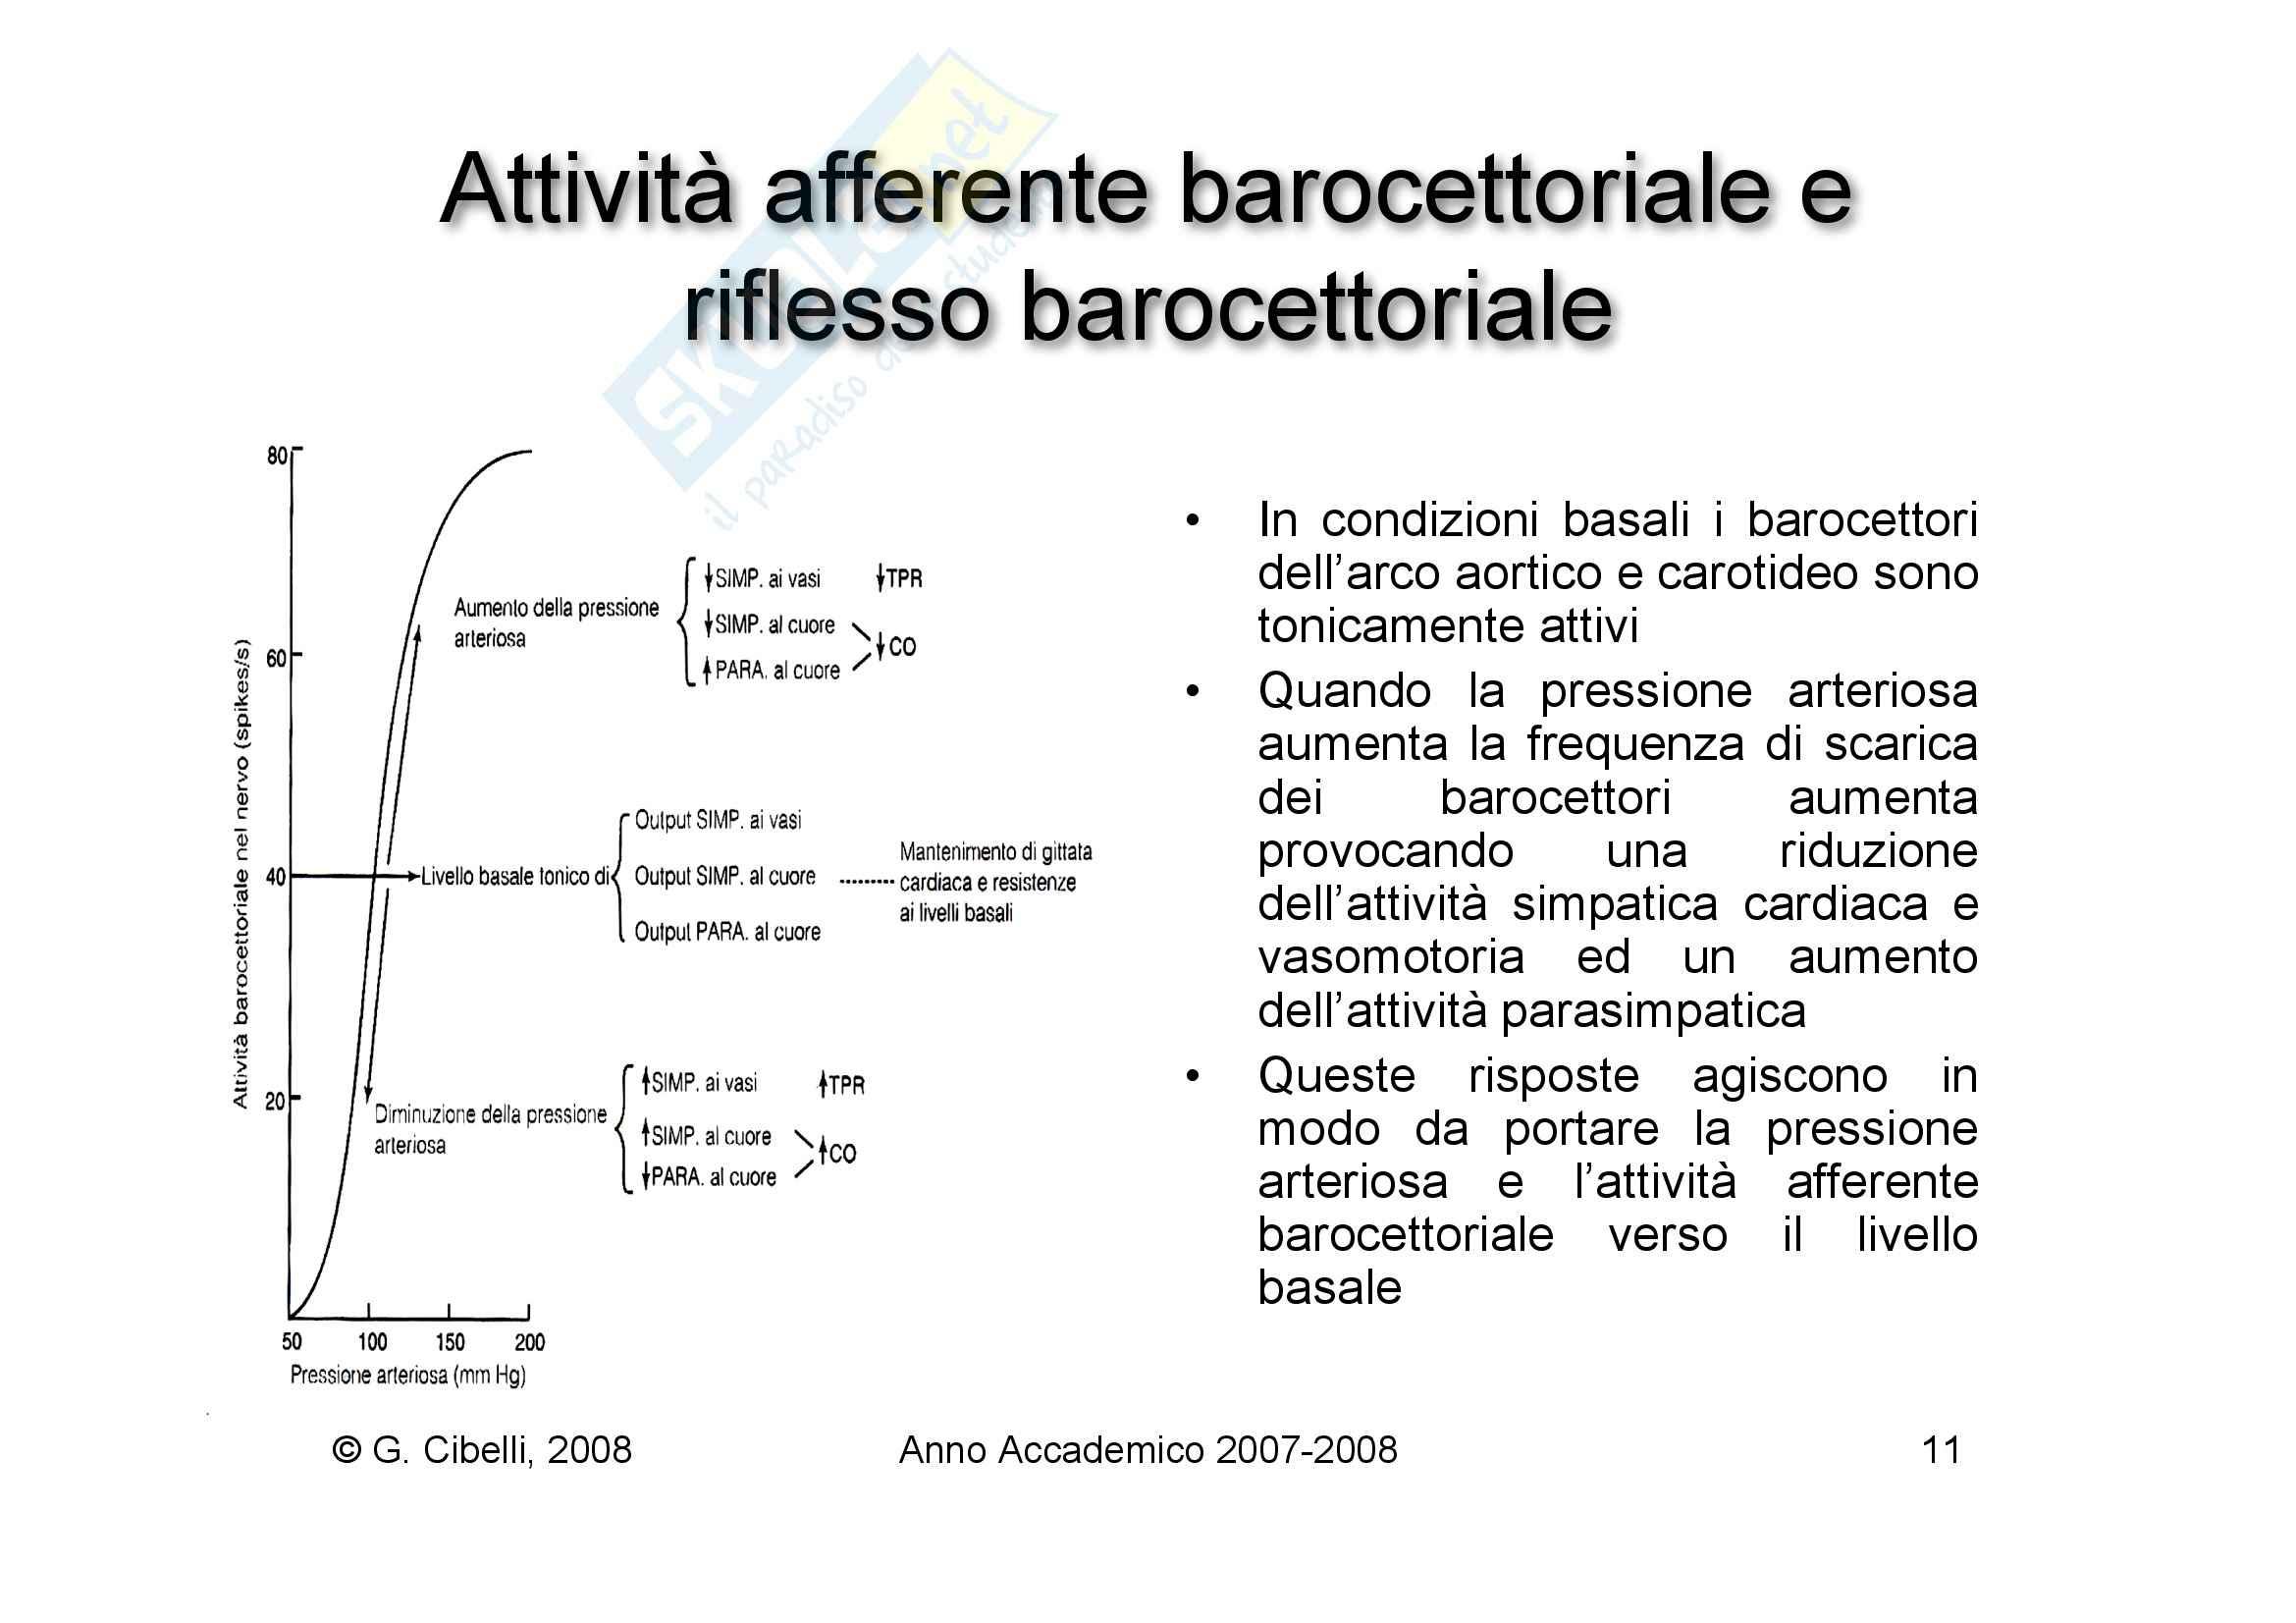 Fisiologia umana I - regolazione nervosa del cuore Pag. 11